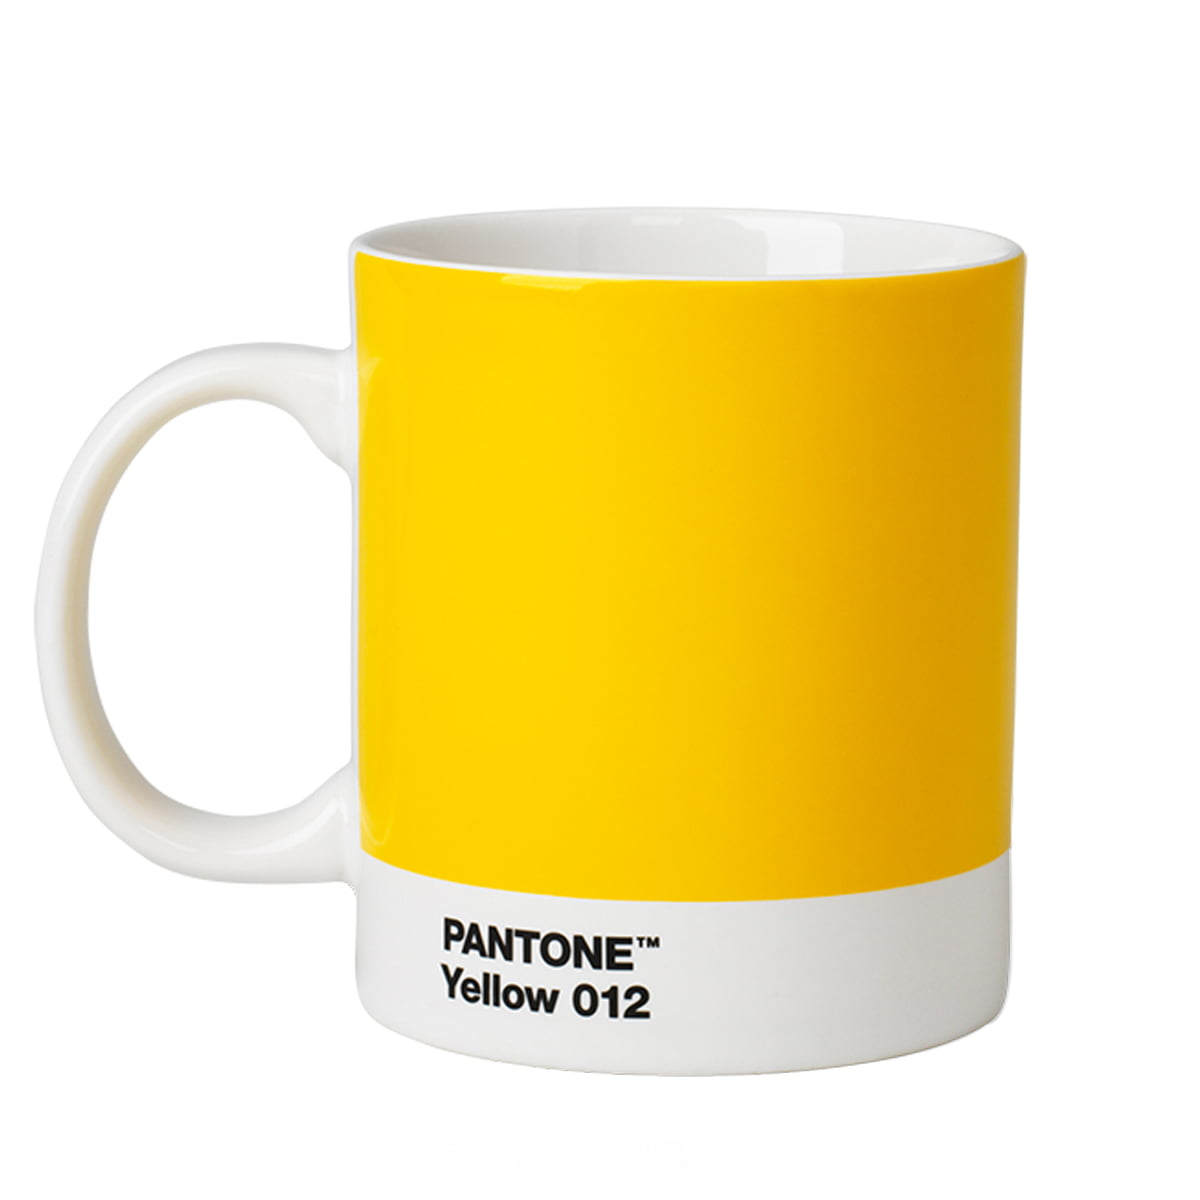 Pantone universe becher yellow 012 frei